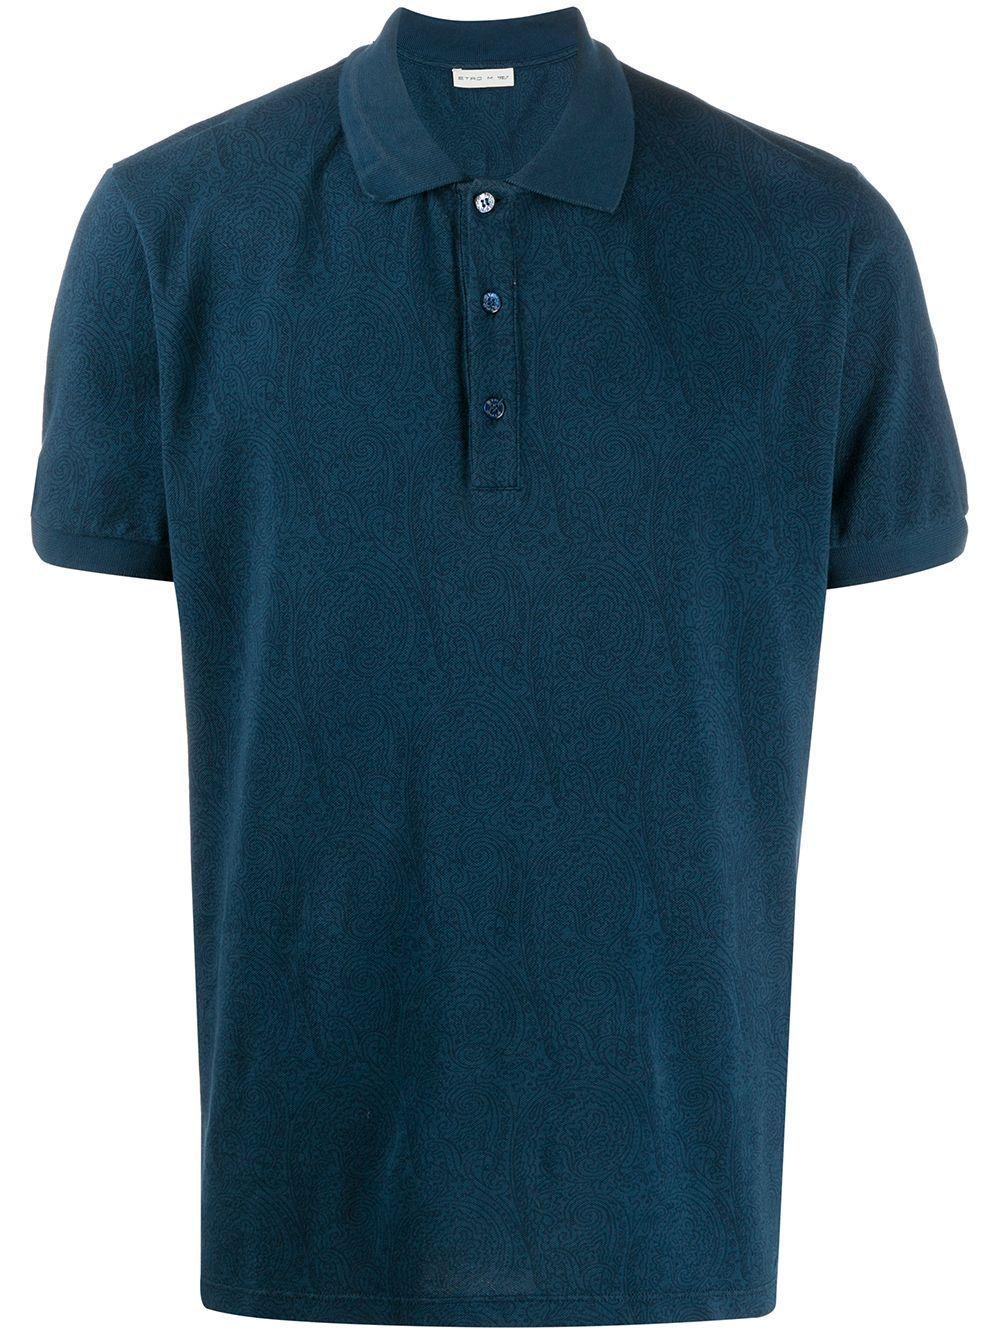 ETRO MEN'S 1Y8059246201 BLUE COTTON POLO SHIRT